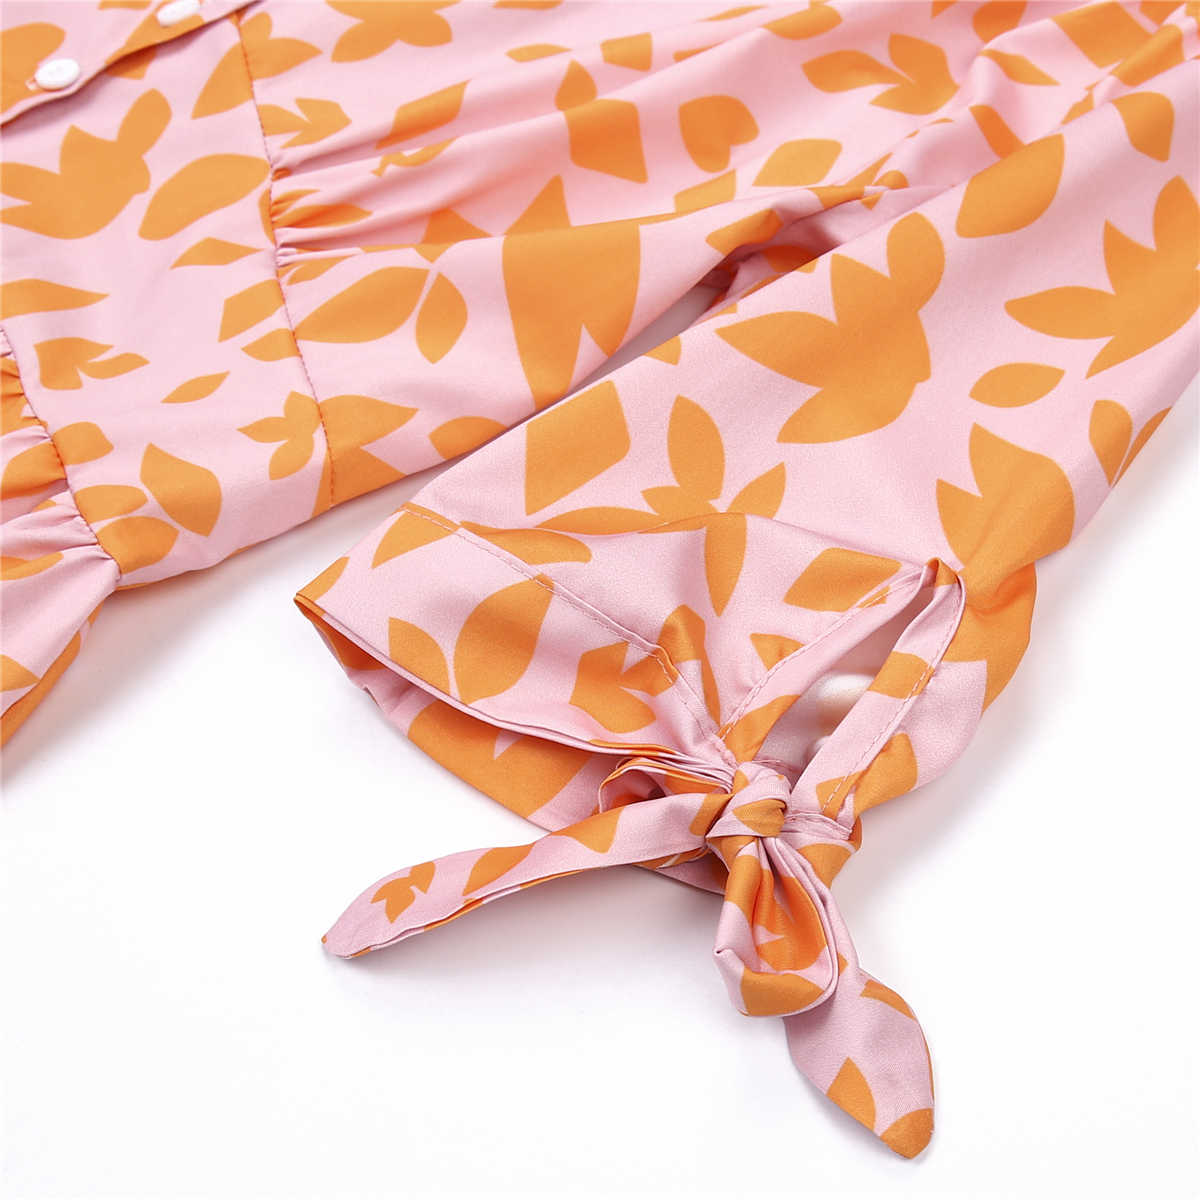 Wanita Mid BoHo Bunga Gaun Musim Panas Pantai Lengan Pendek V Leher Malam Pesta Bohemian Pantai Pakaian 2019 Musim Panas Vestidos